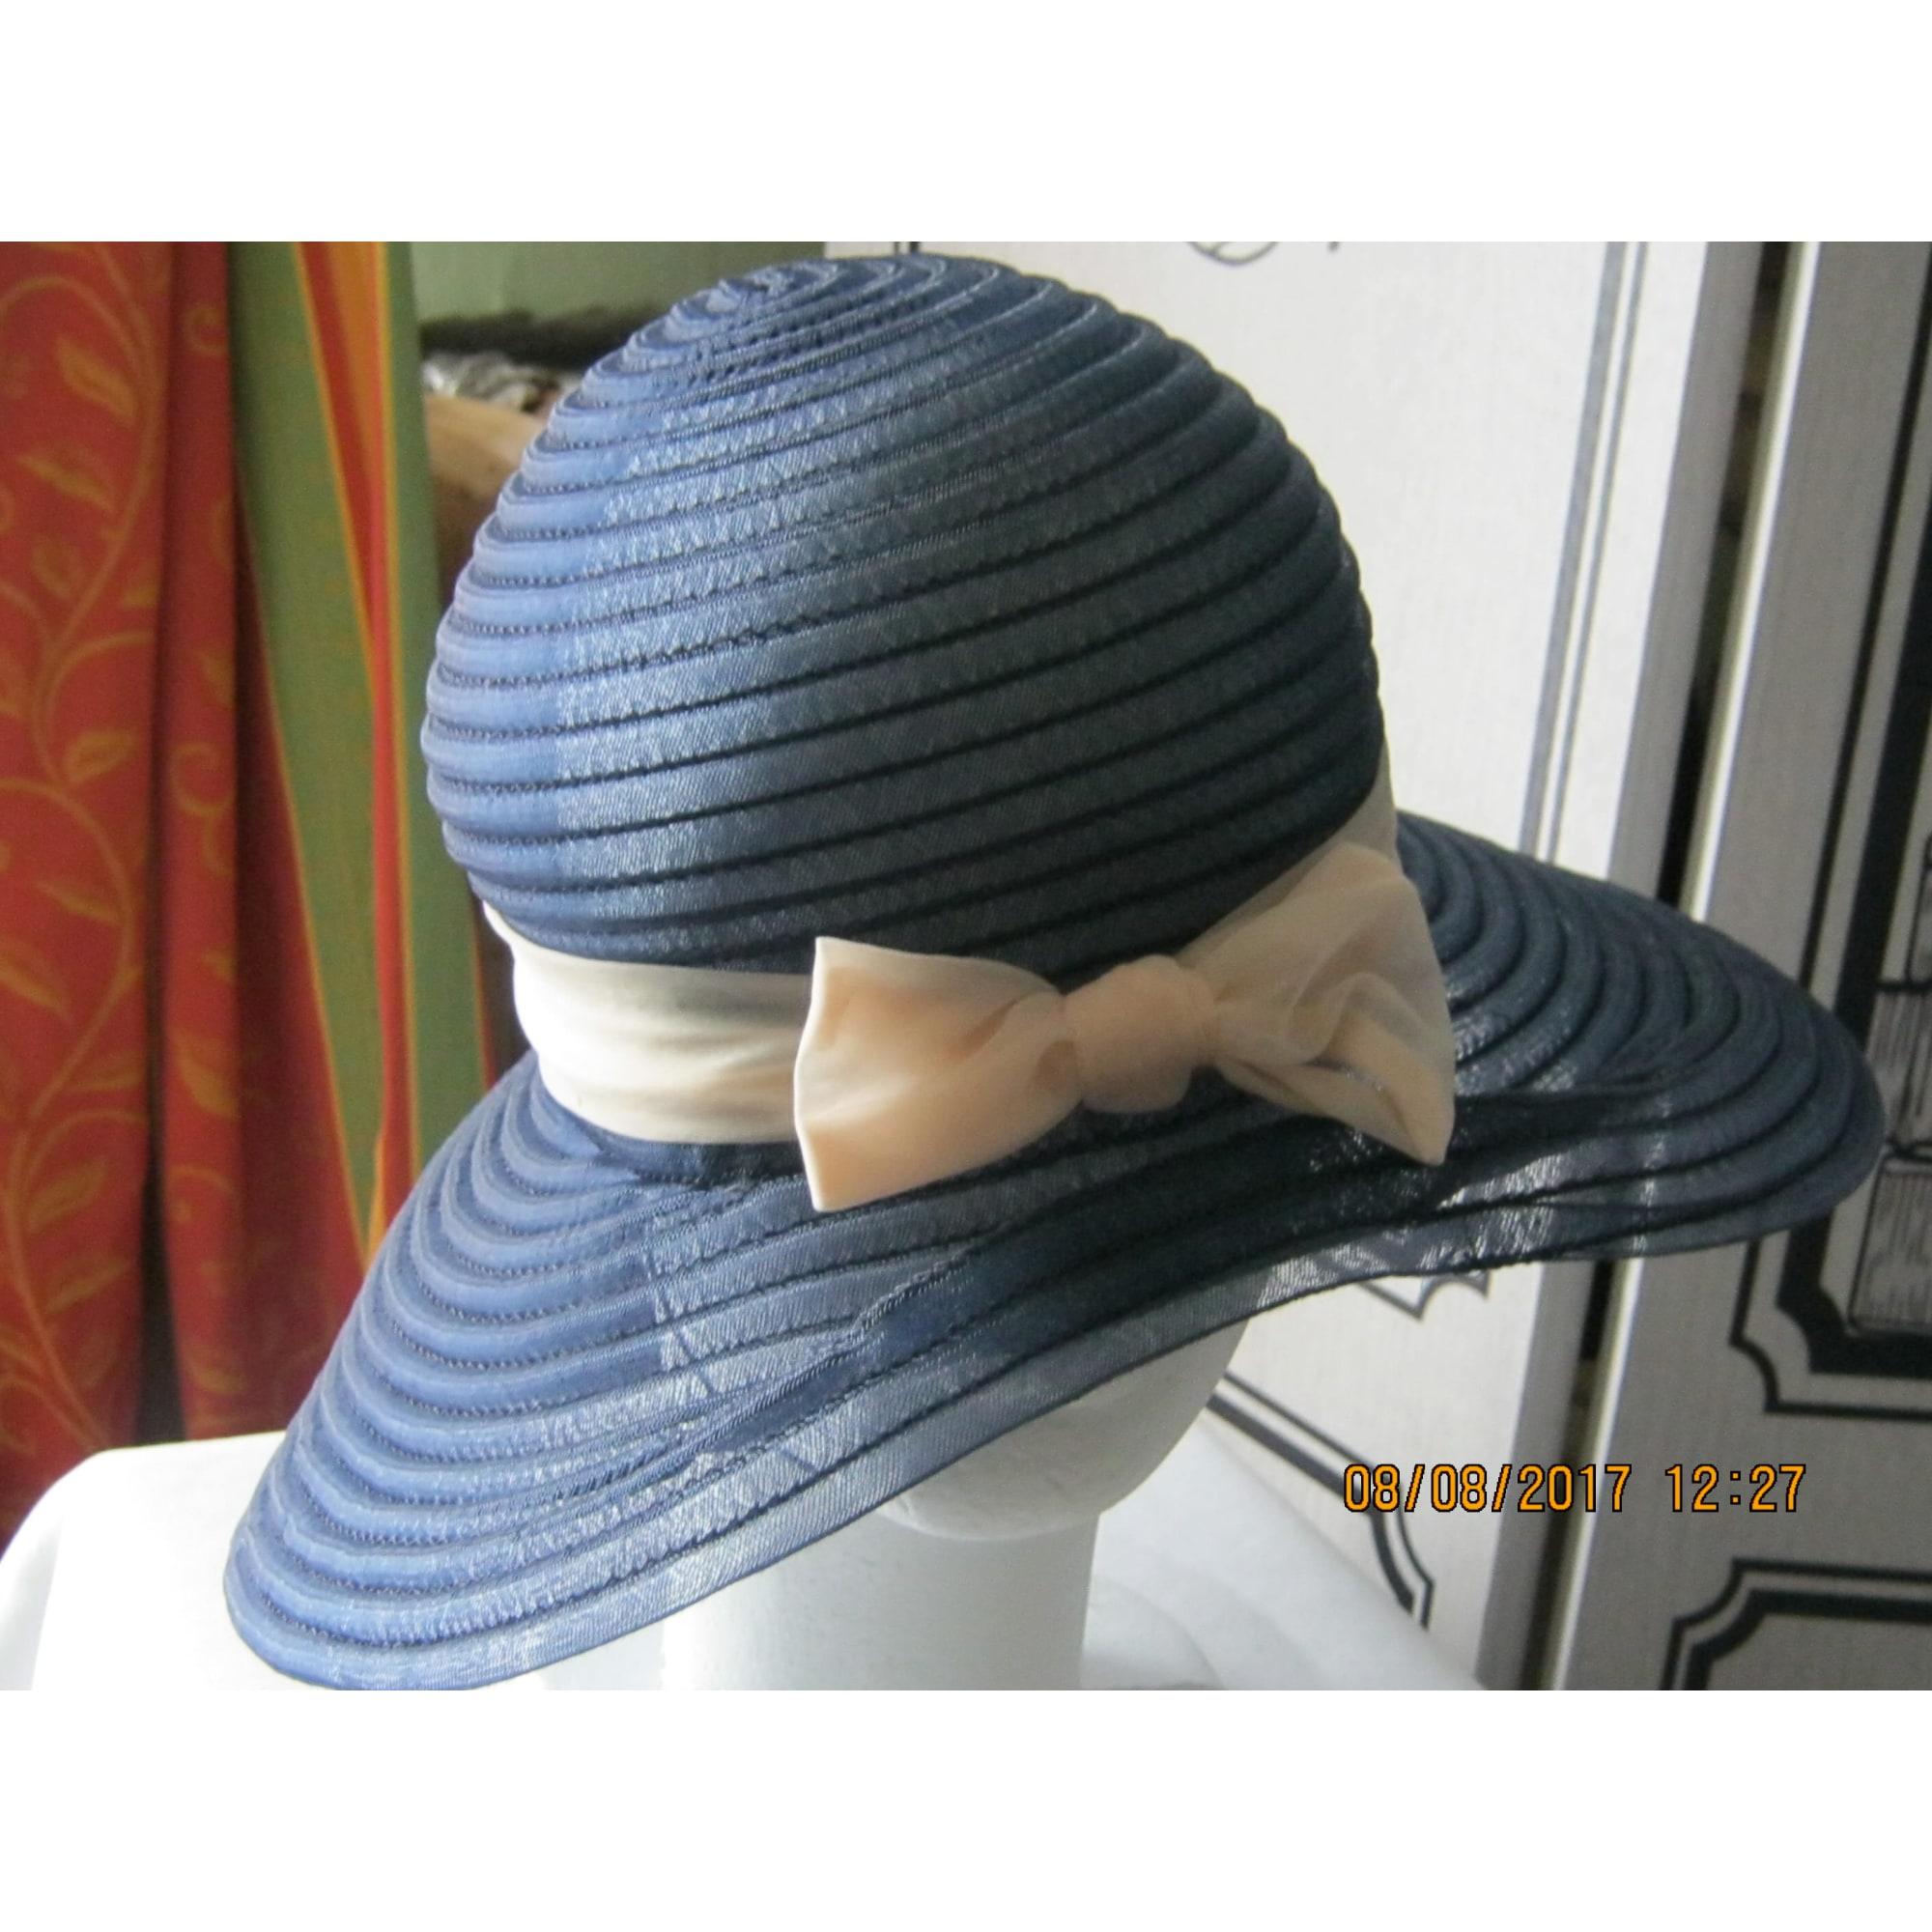 Chapeau INCONNU Bleu, bleu marine, bleu turquoise